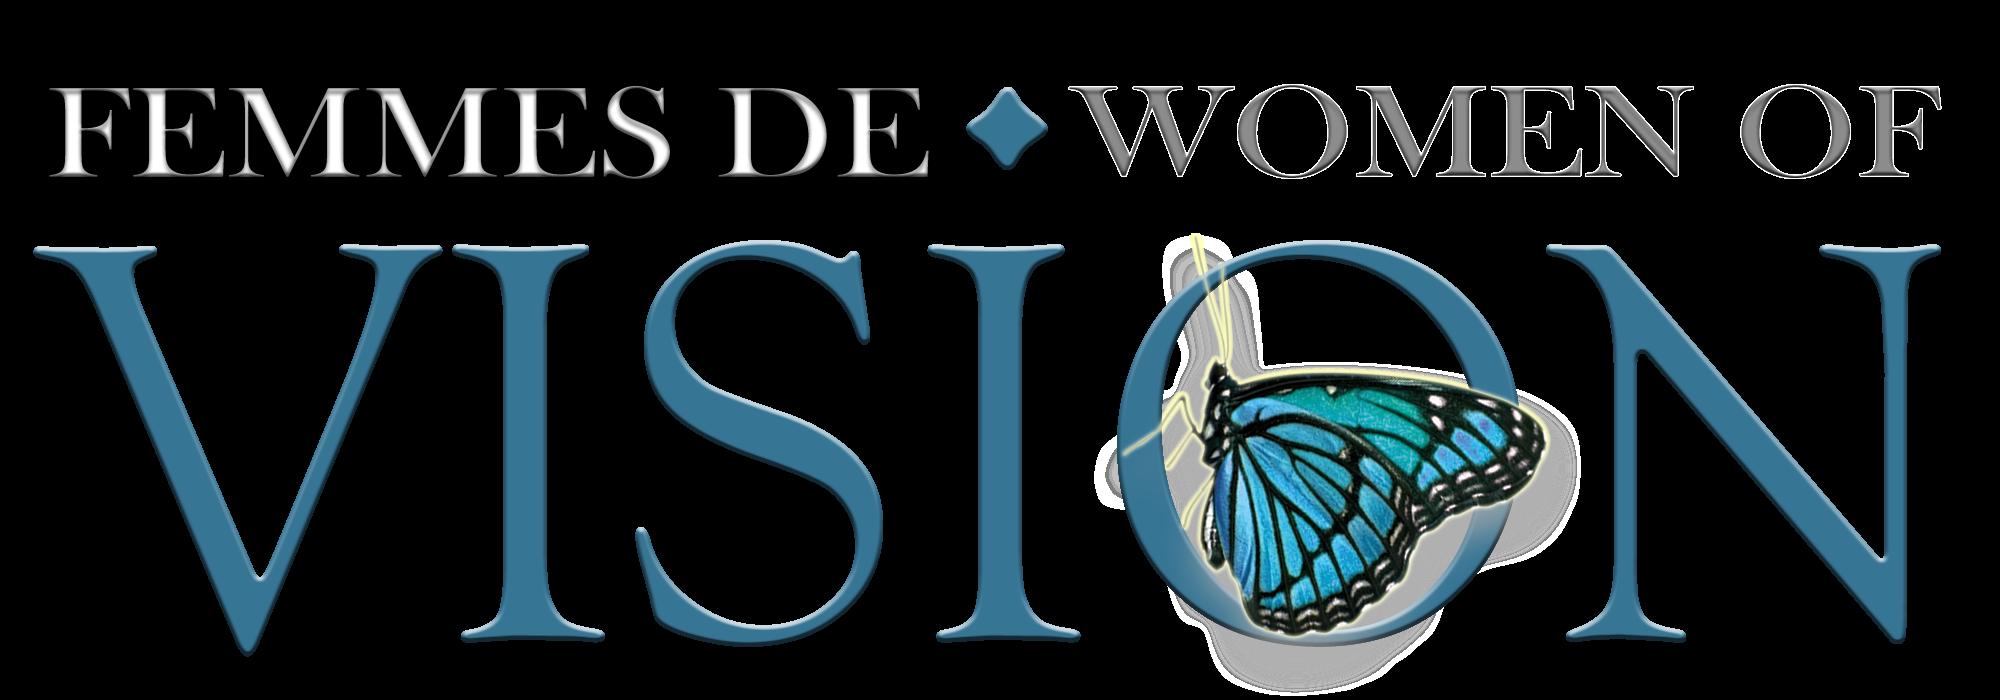 Femmes de Vision - Logo